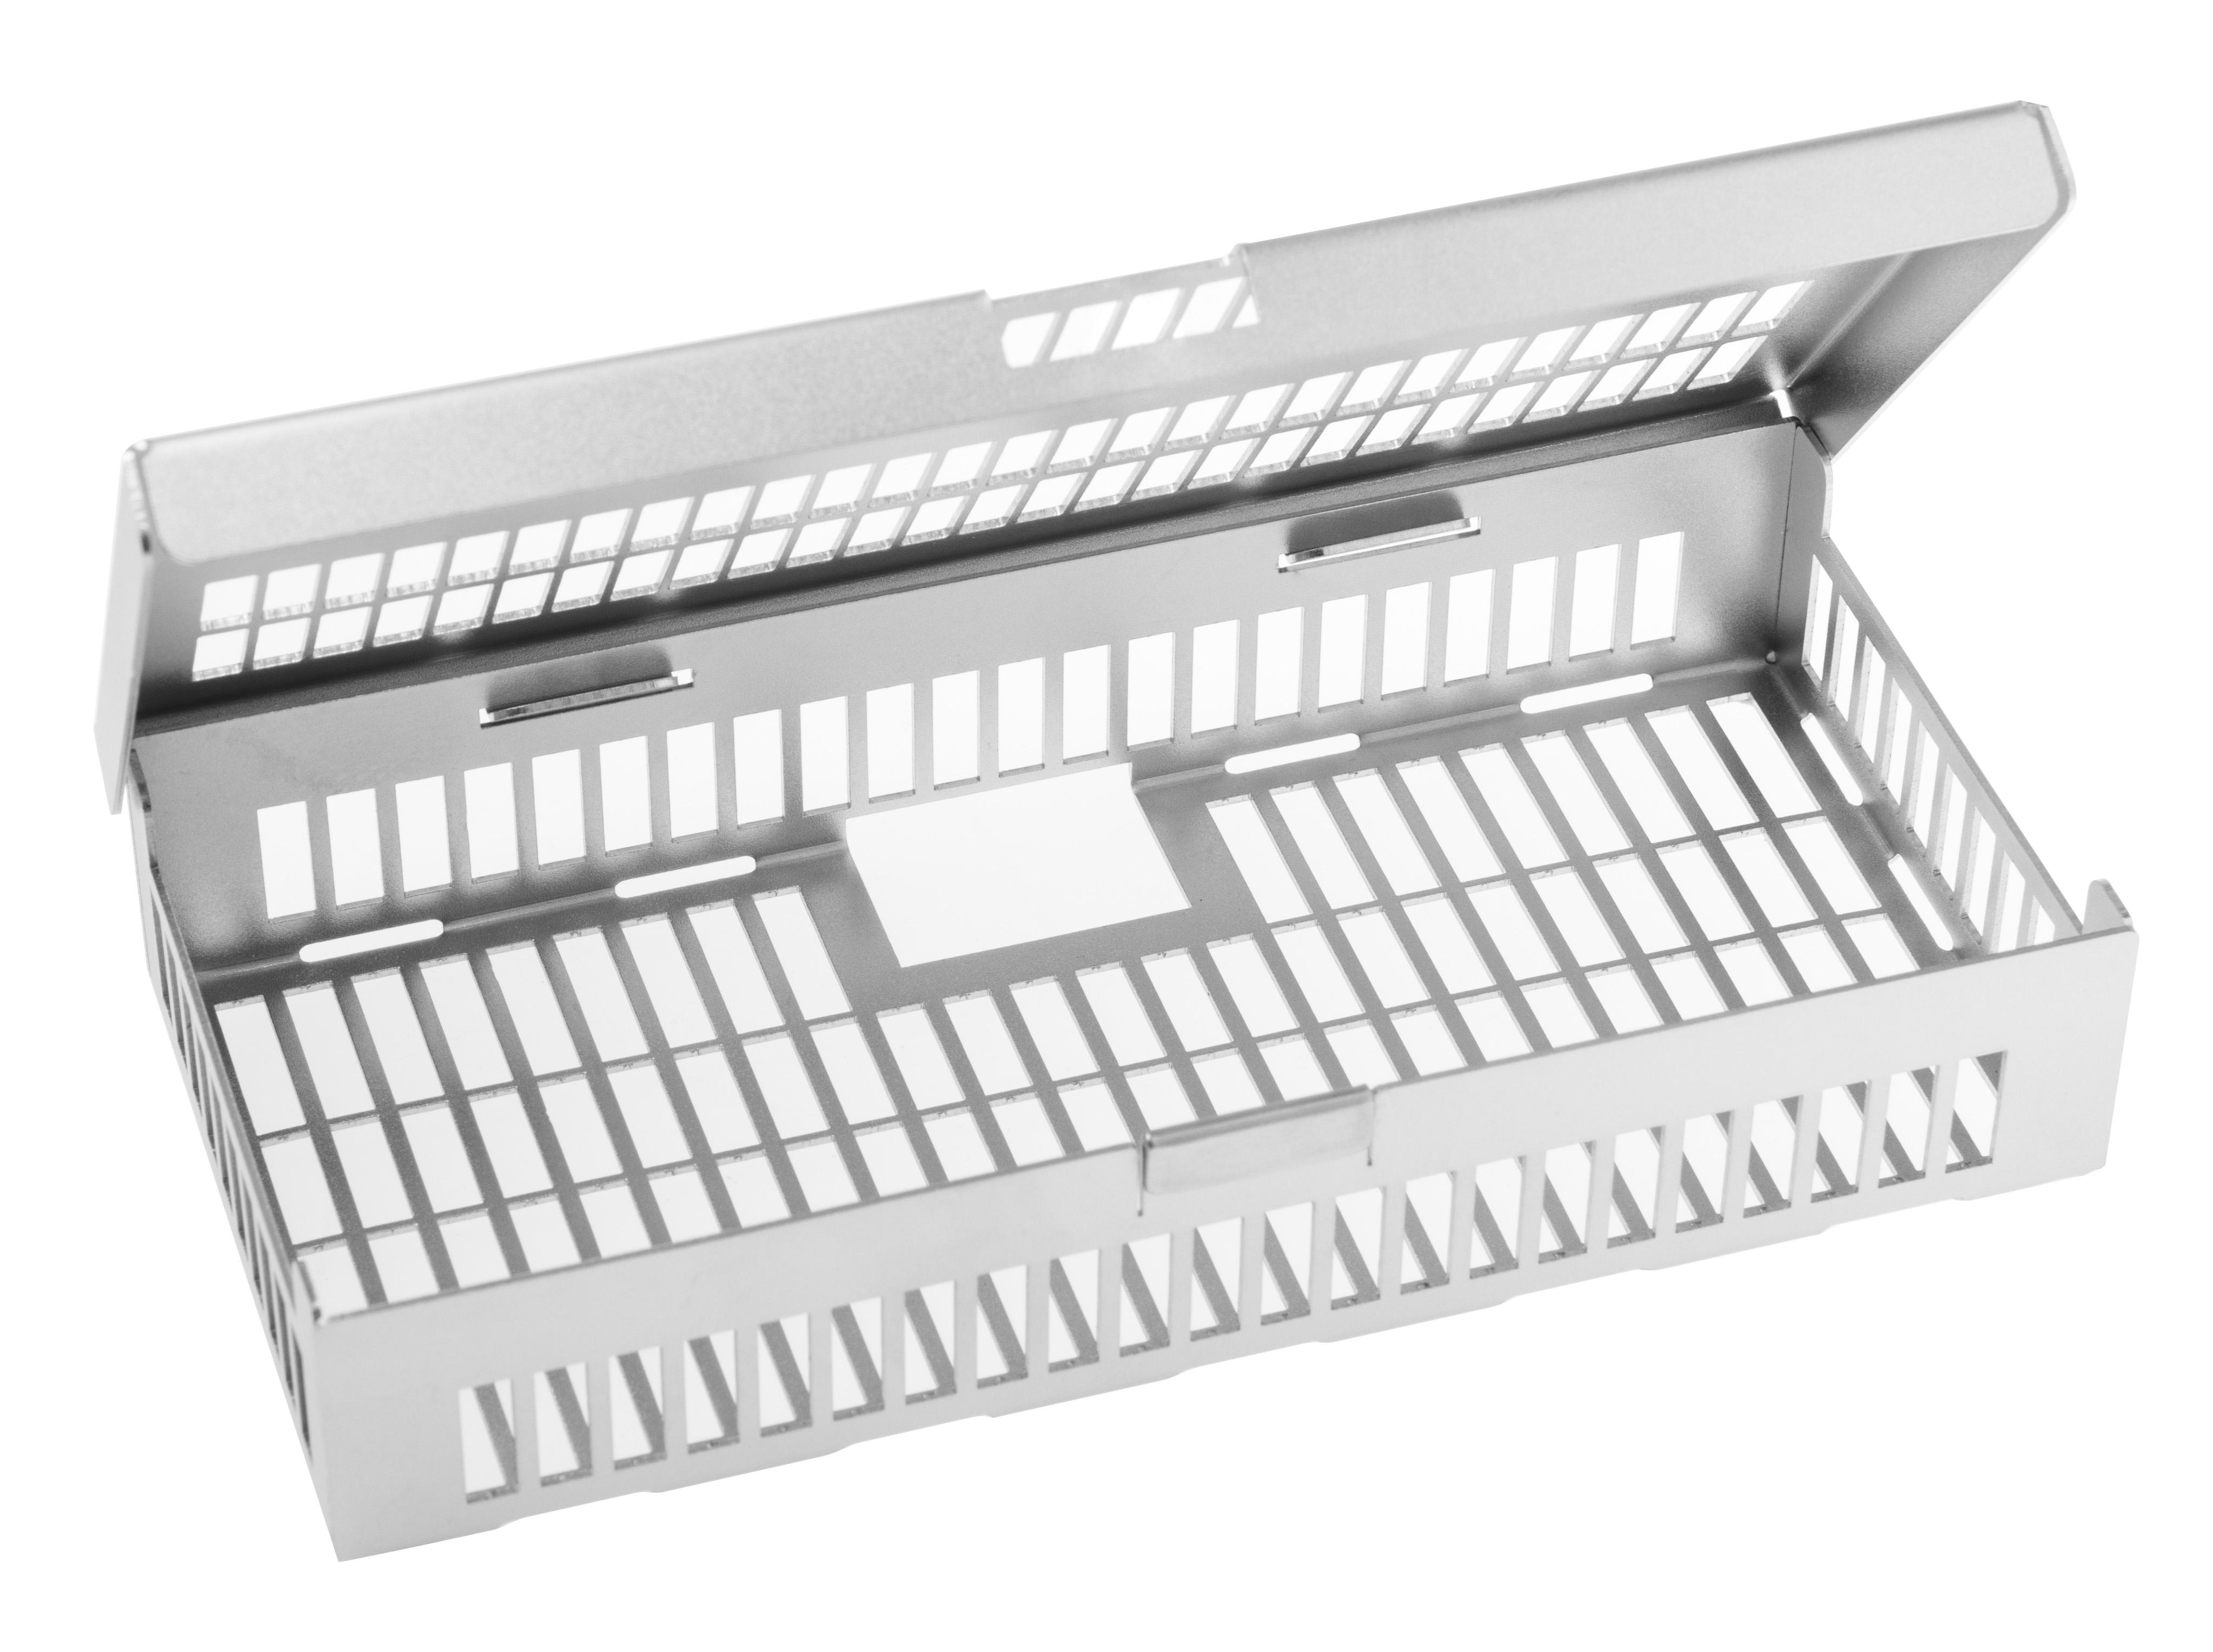 BASIC Wash Tray  (180x87x35mm)